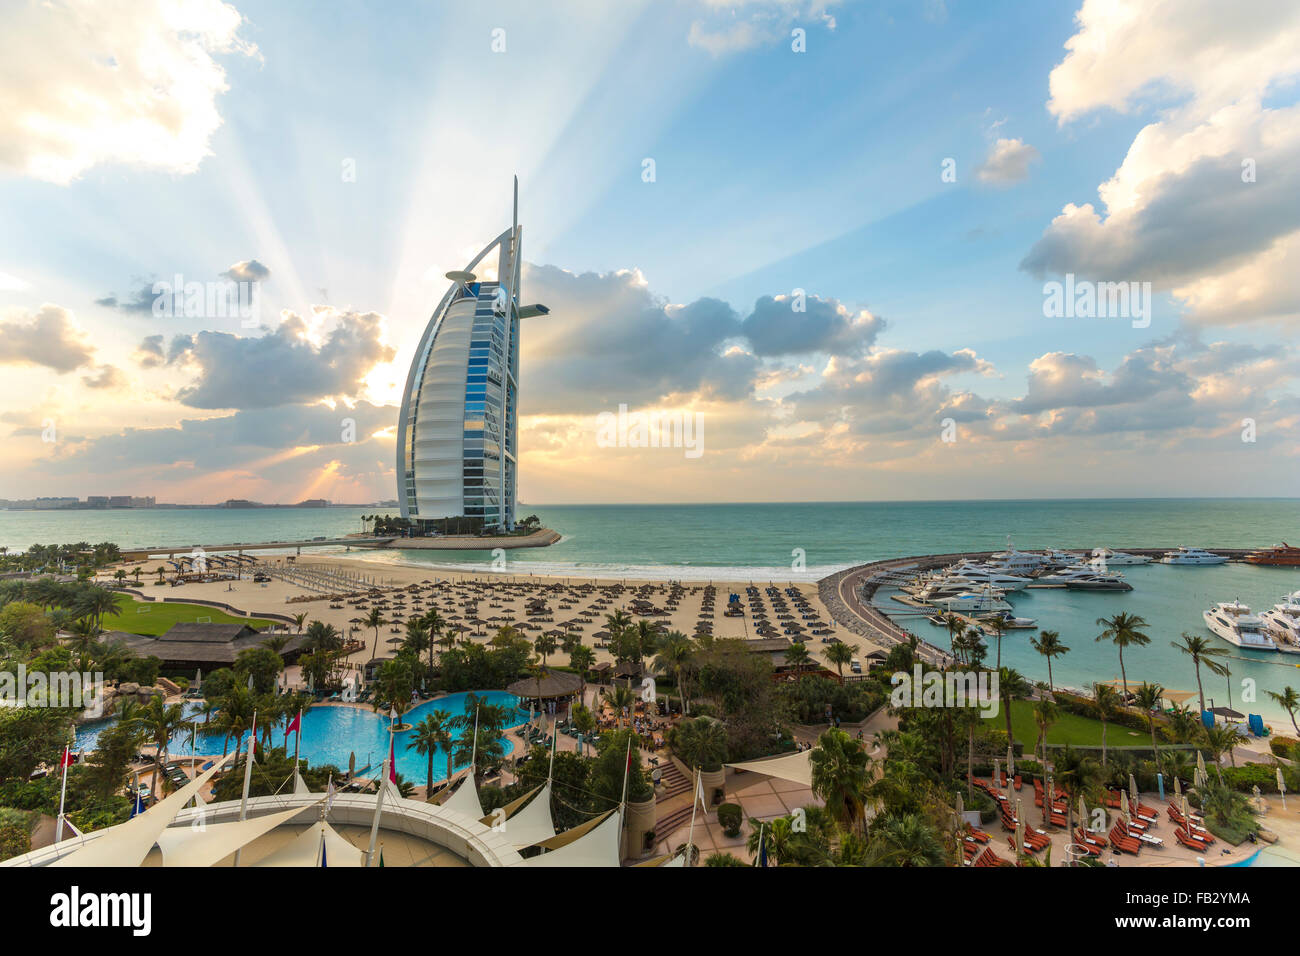 Jumeirah Beach, il Burj Al Arab Hotel, Dubai, Emirati Arabi Uniti, Medio Oriente Immagini Stock